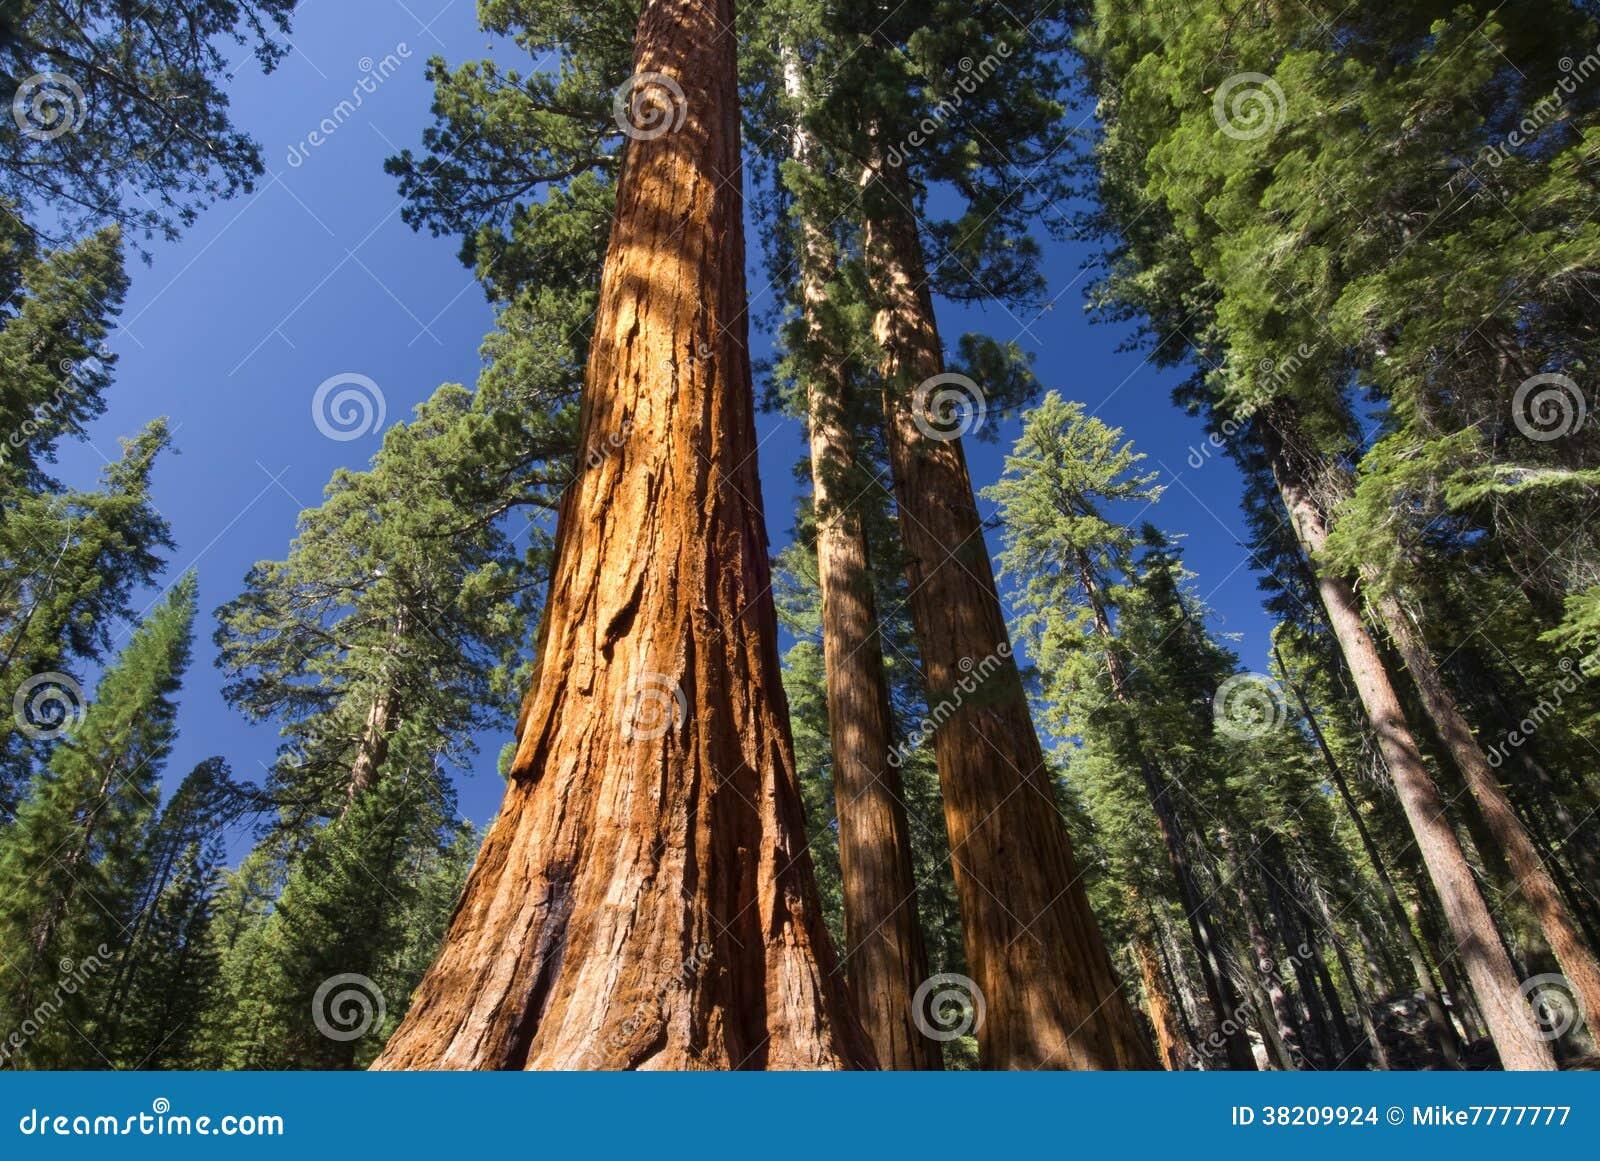 Fabuleux Giant Sequoia Tree, Mariposa Grove, Yosemite National Park  XN94